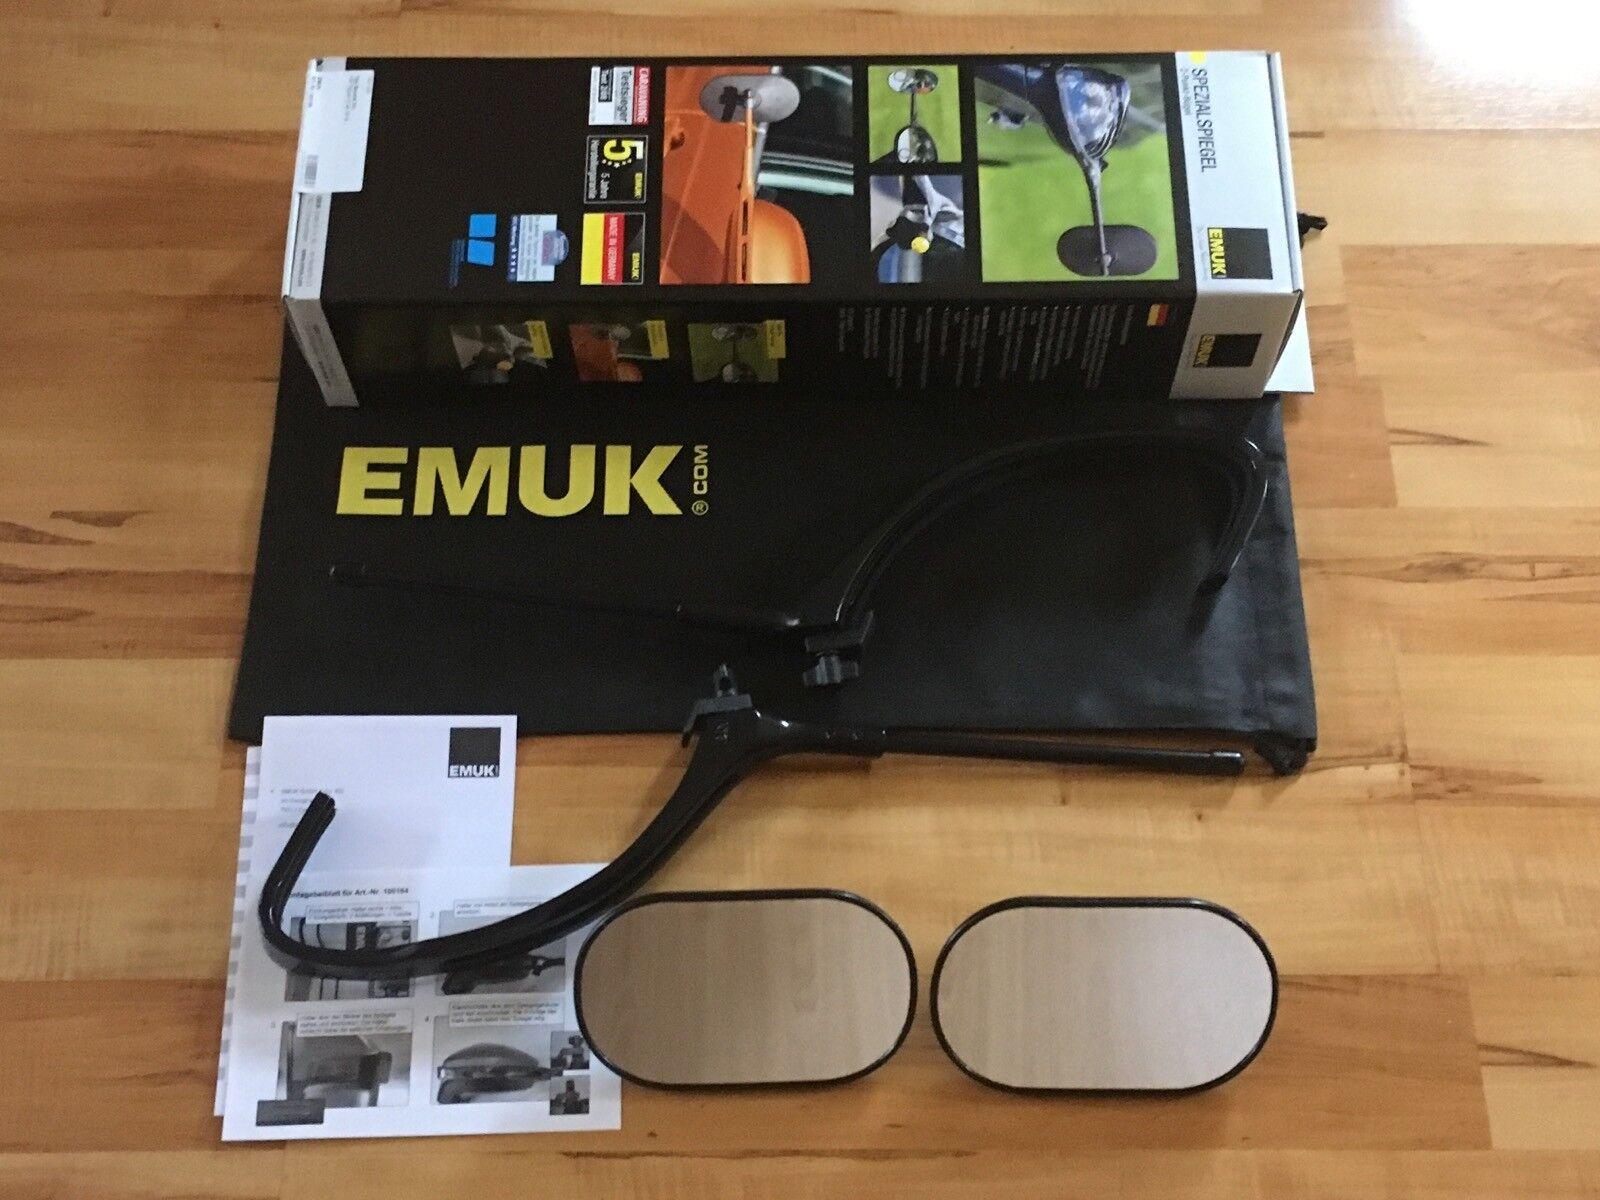 Emuk Spiegels Volkswagen : Emuk spiegel vw tiguan ii wohnwagenspiegel